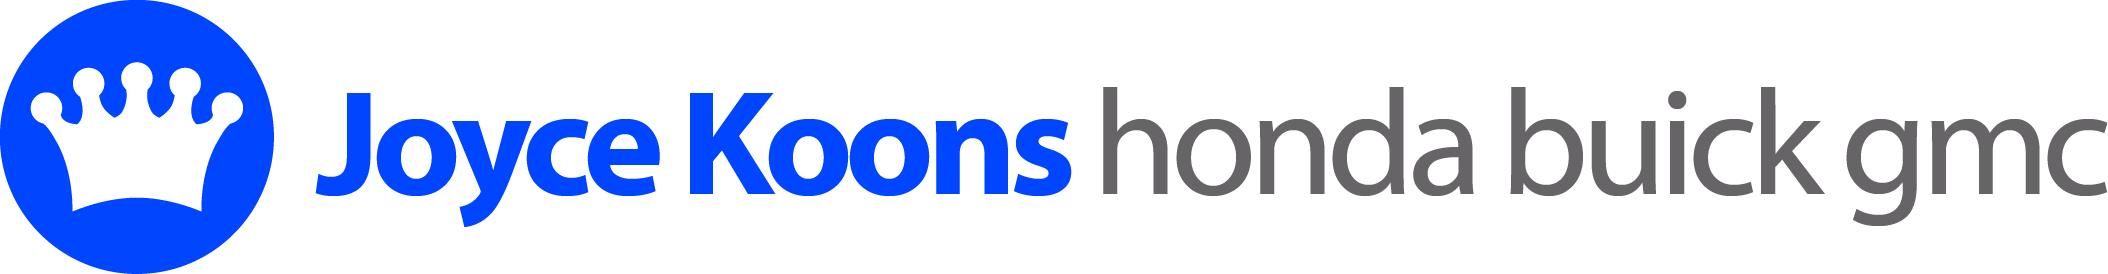 Joyce Koons Honda Buick GMC